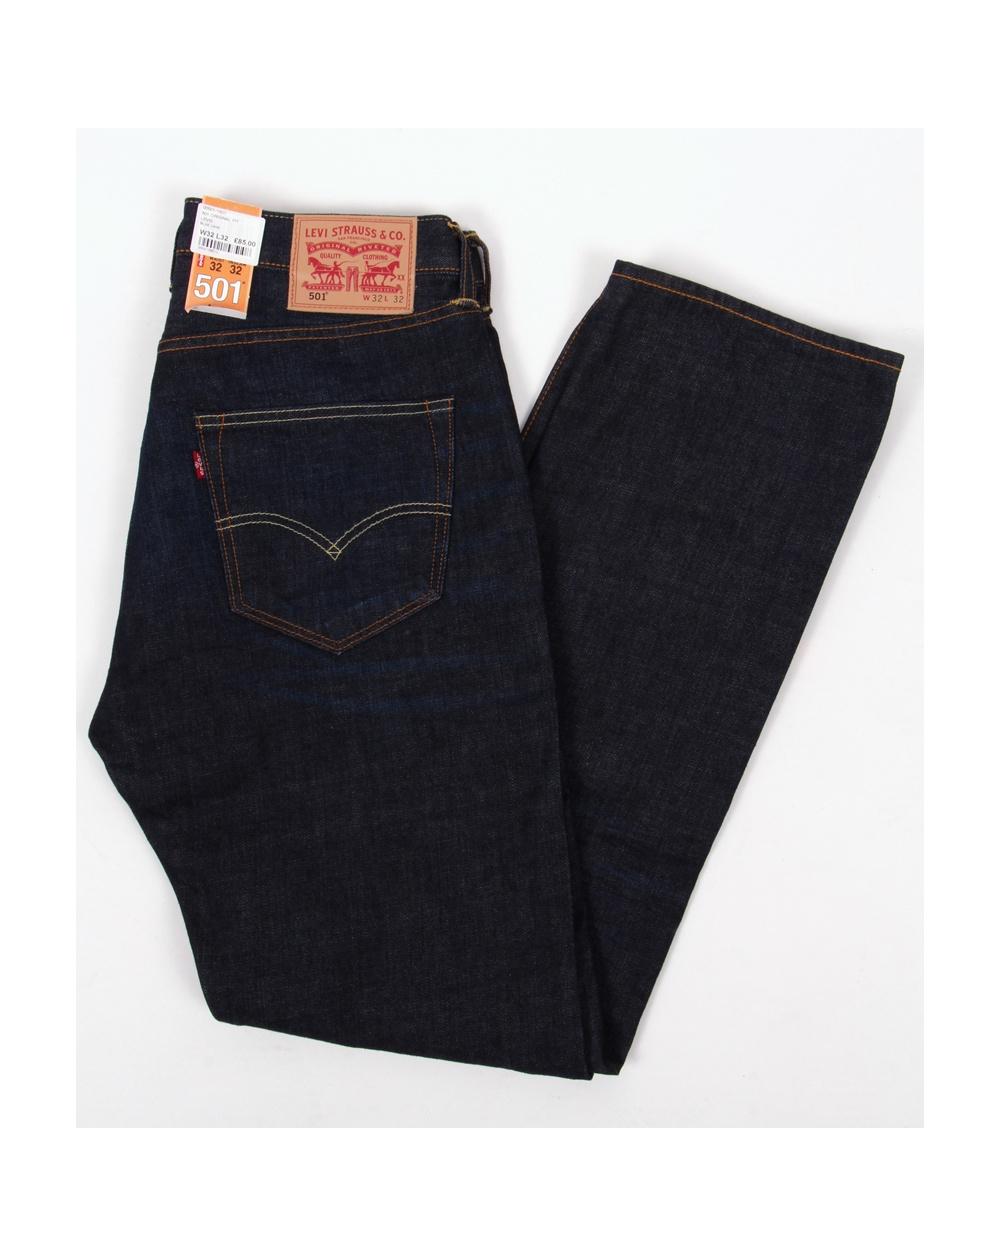 501 Mens Jeans